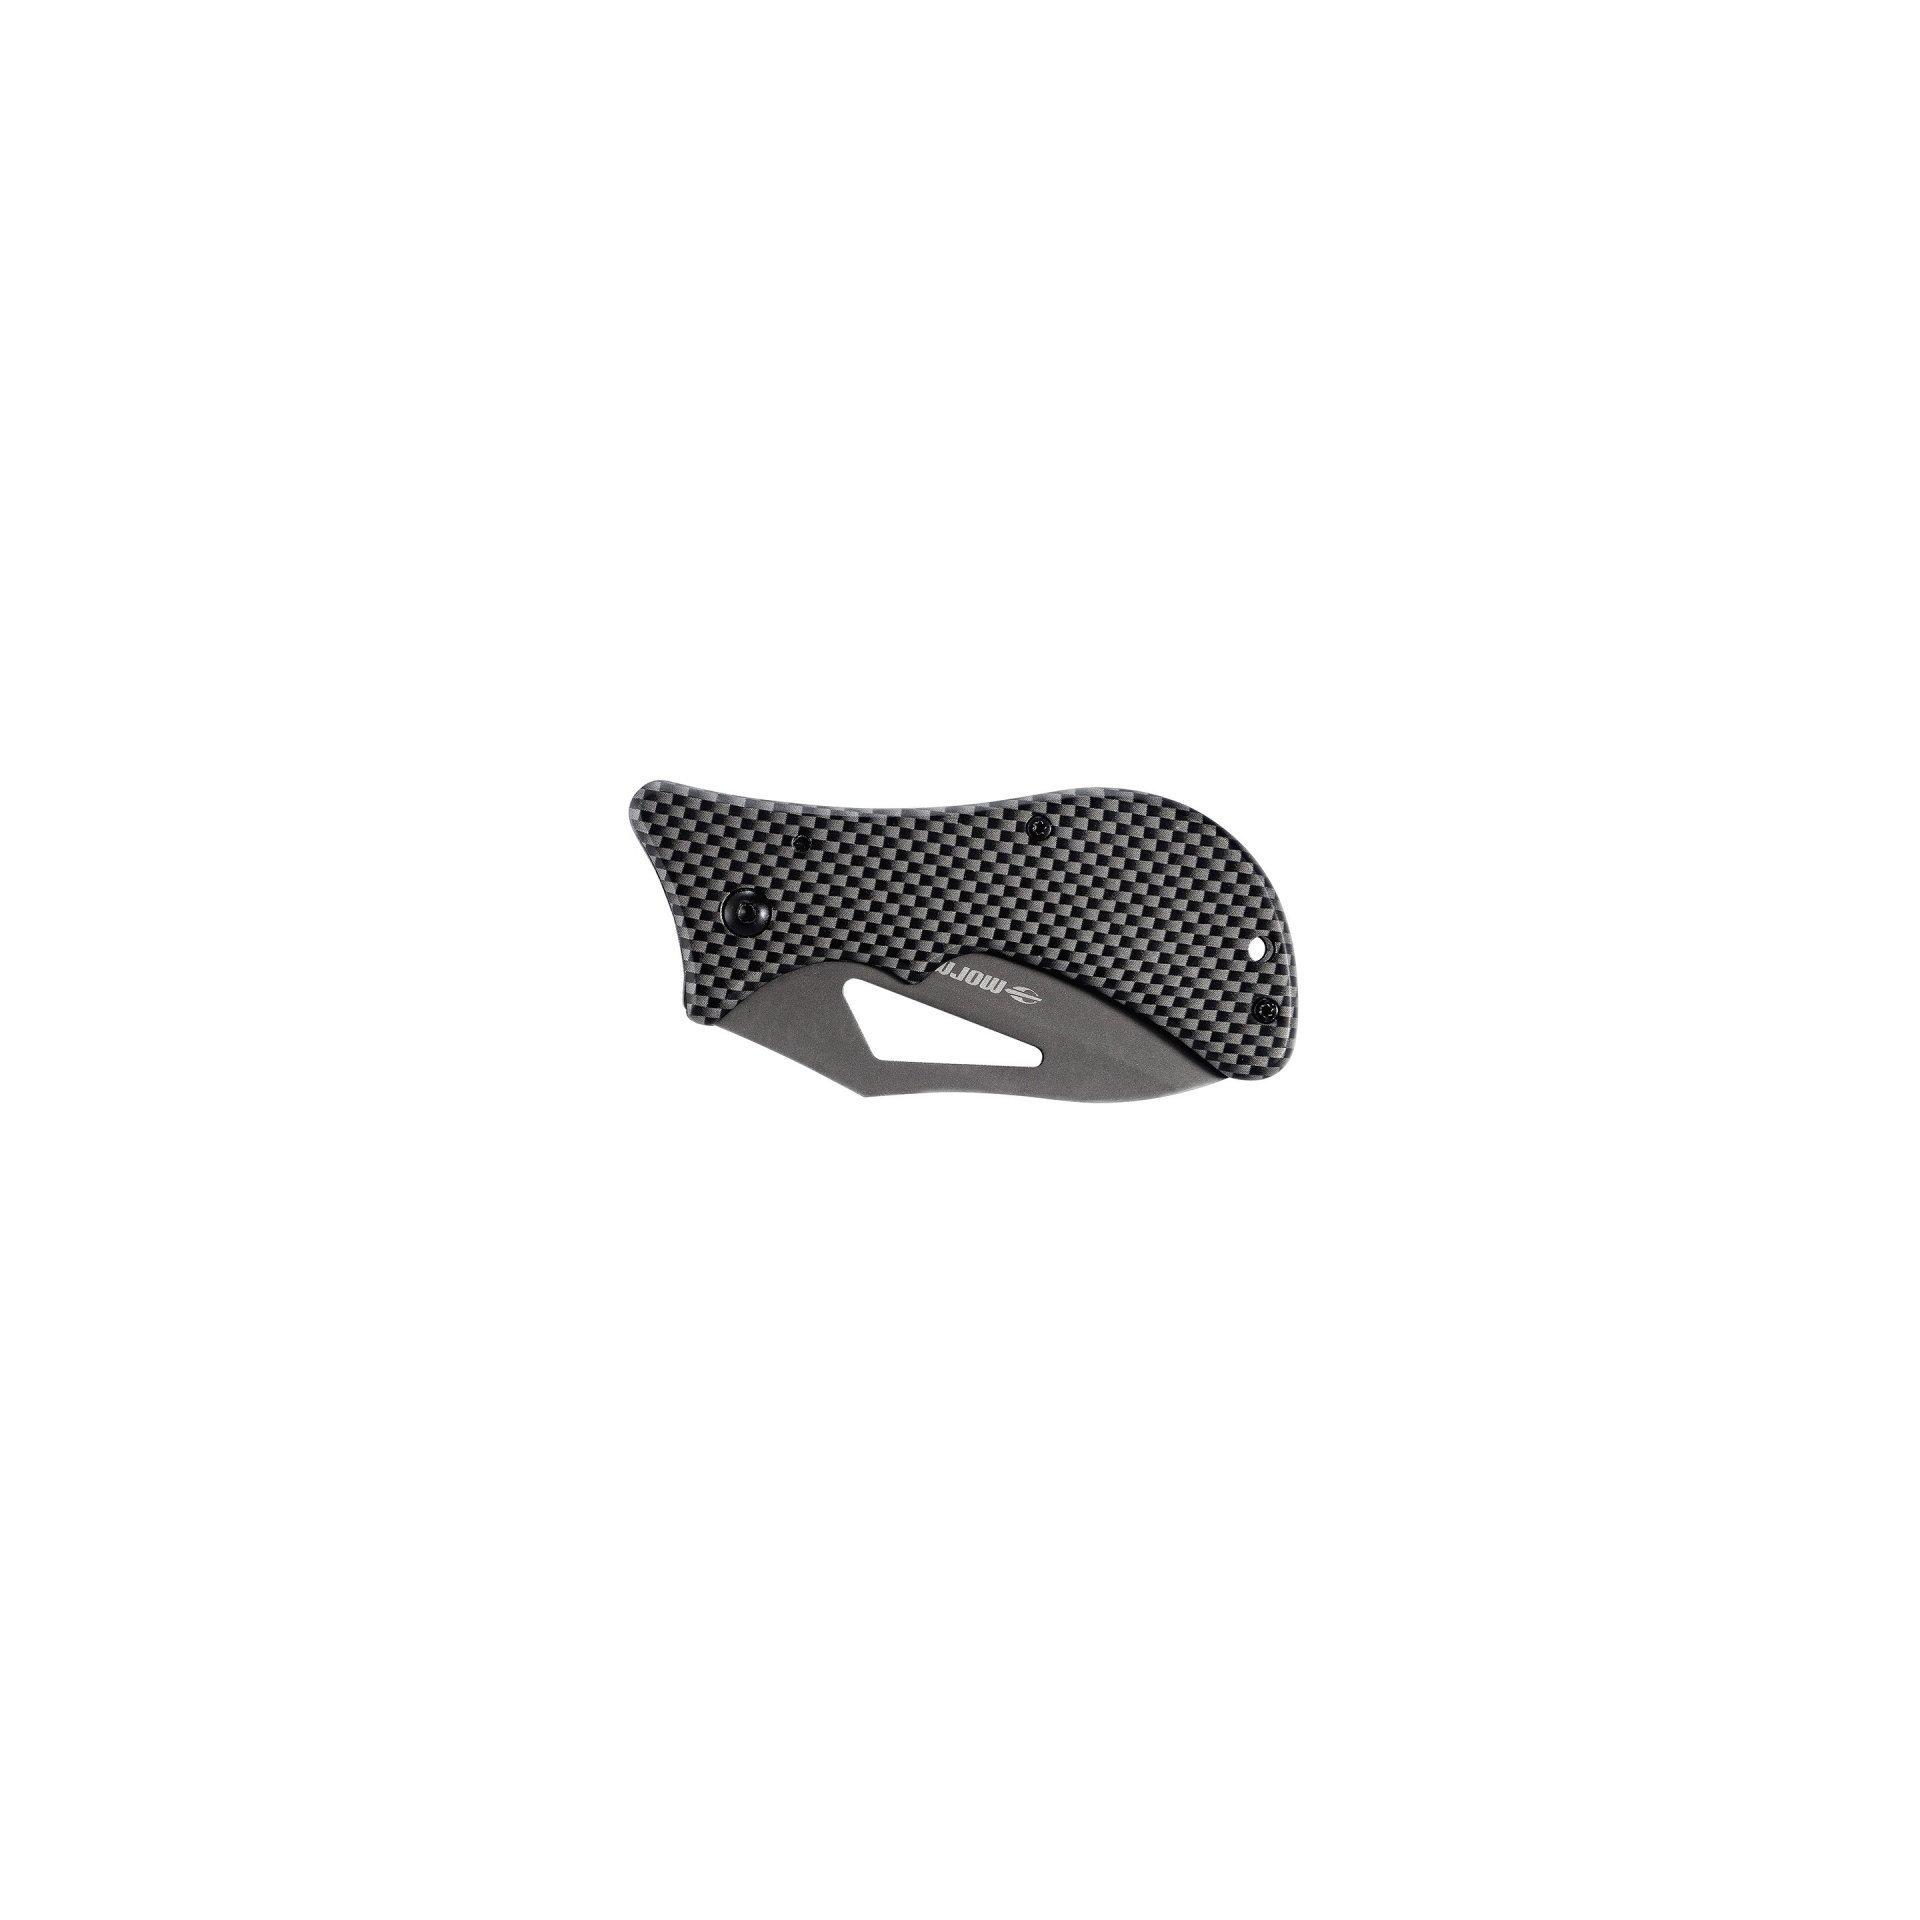 Canivete Tatico Carbon Ii Black - Mormaii